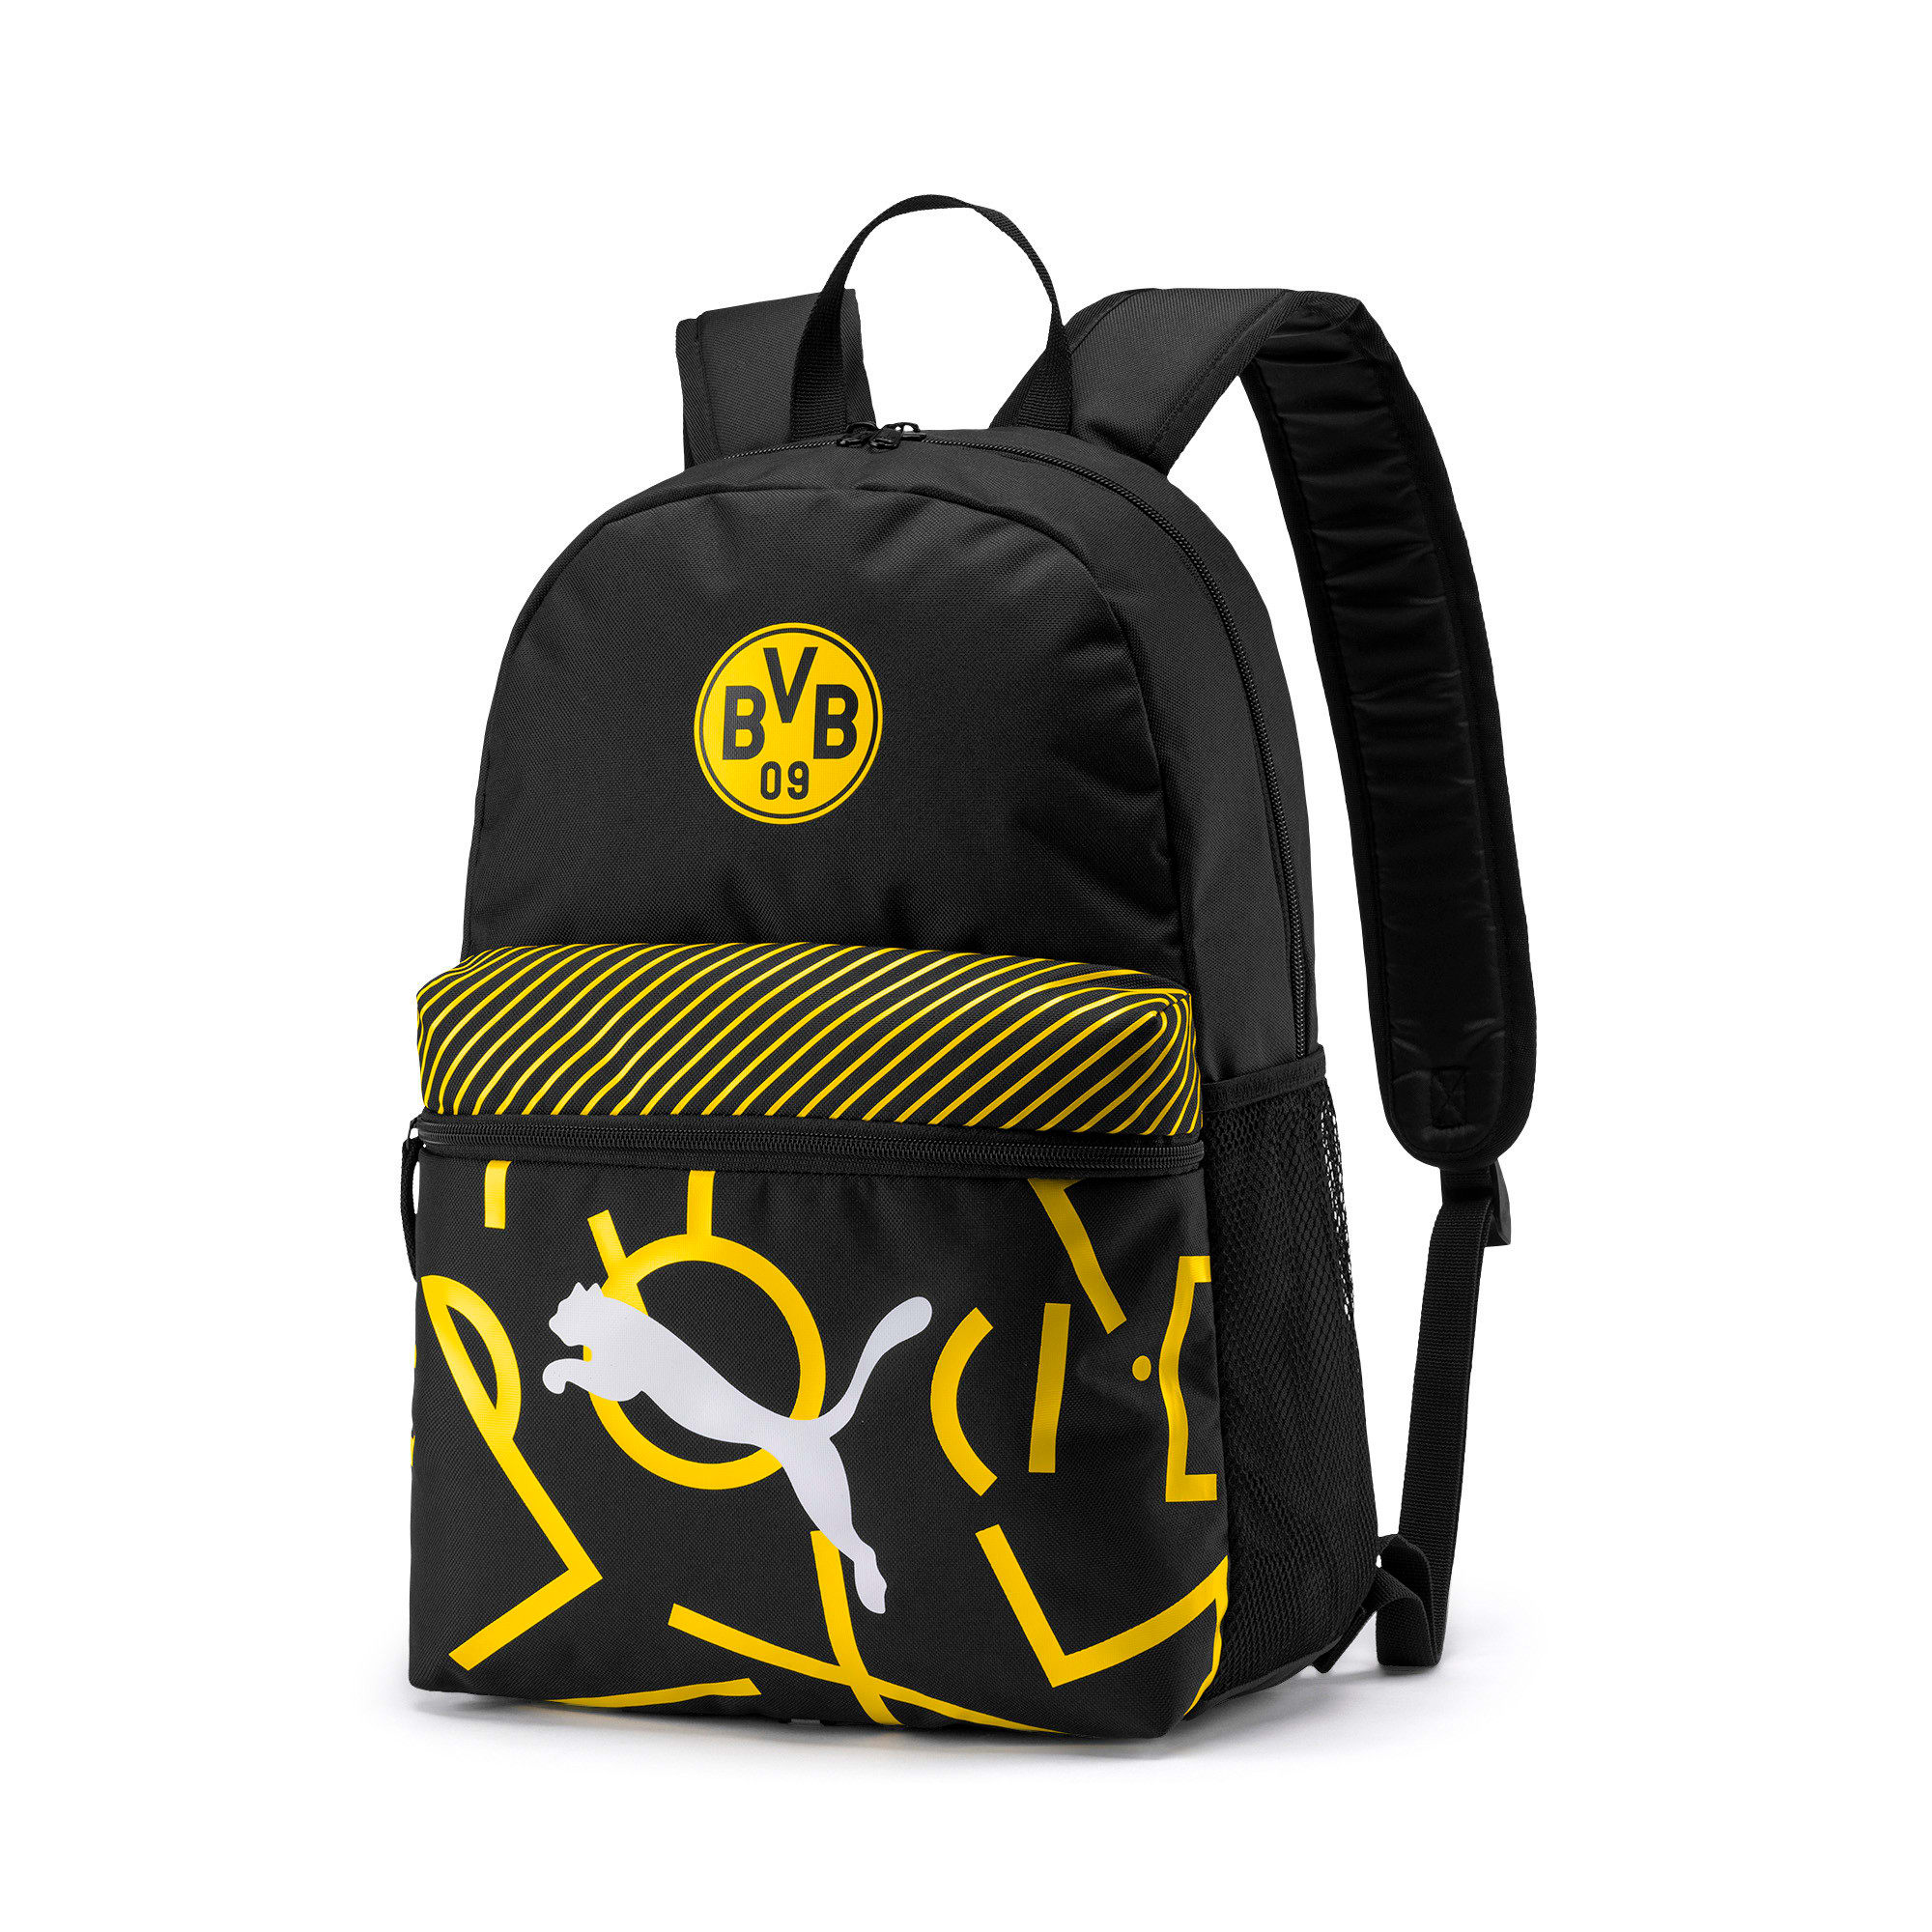 Thumbnail 1 of BVB DNA Backpack, Puma Black-Cyber Yellow, medium